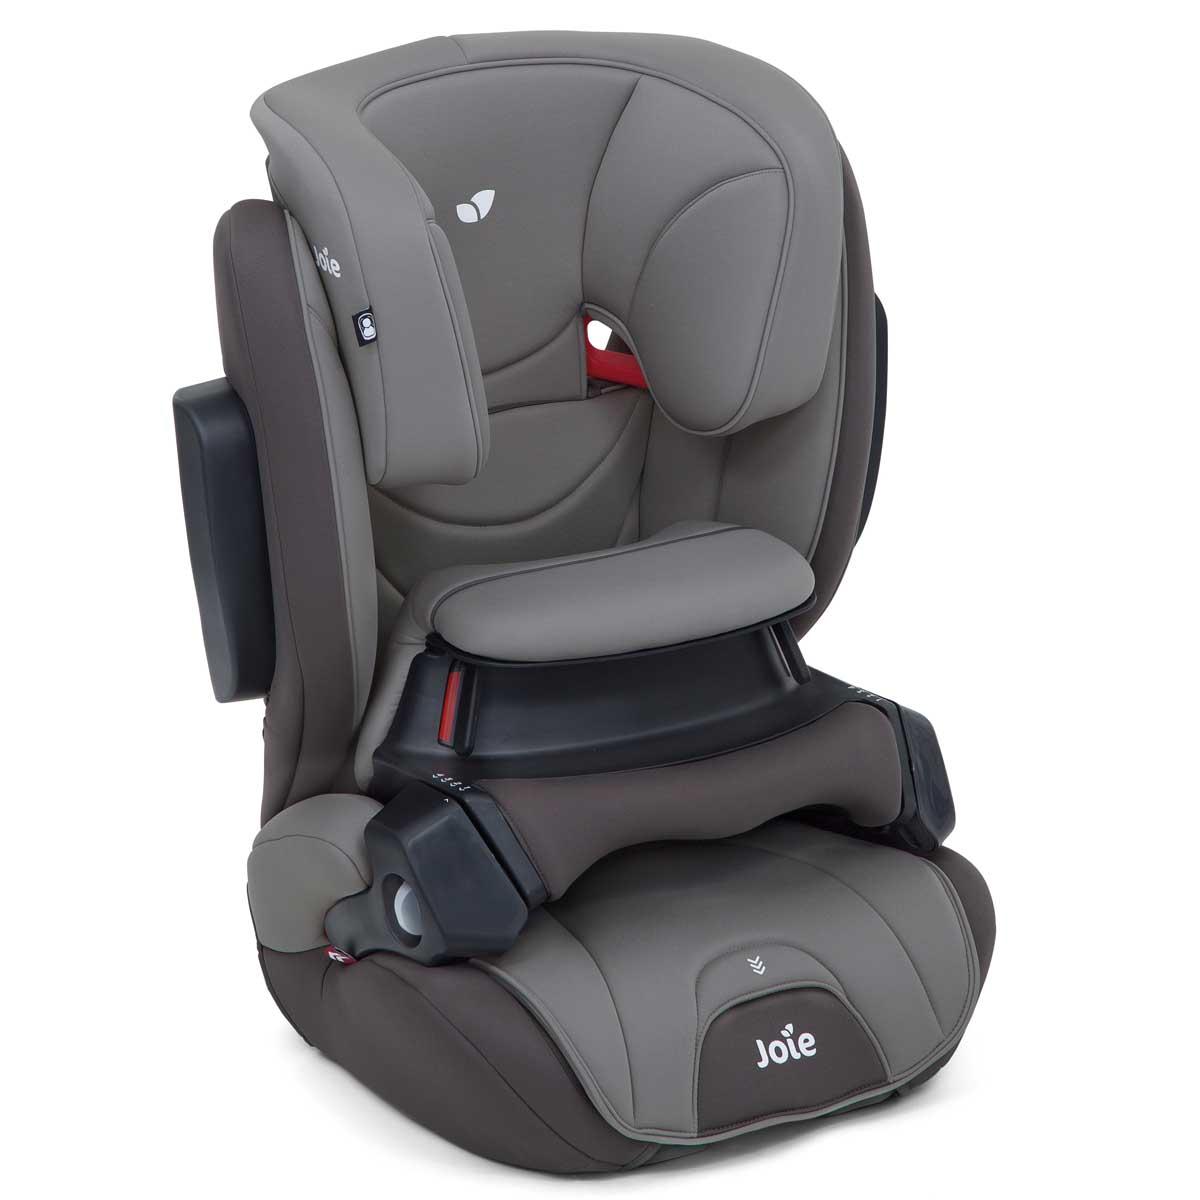 joie traver shield autositz kindersitz isofix kinderautositz gr 1 2 3 neu 2018 ebay. Black Bedroom Furniture Sets. Home Design Ideas